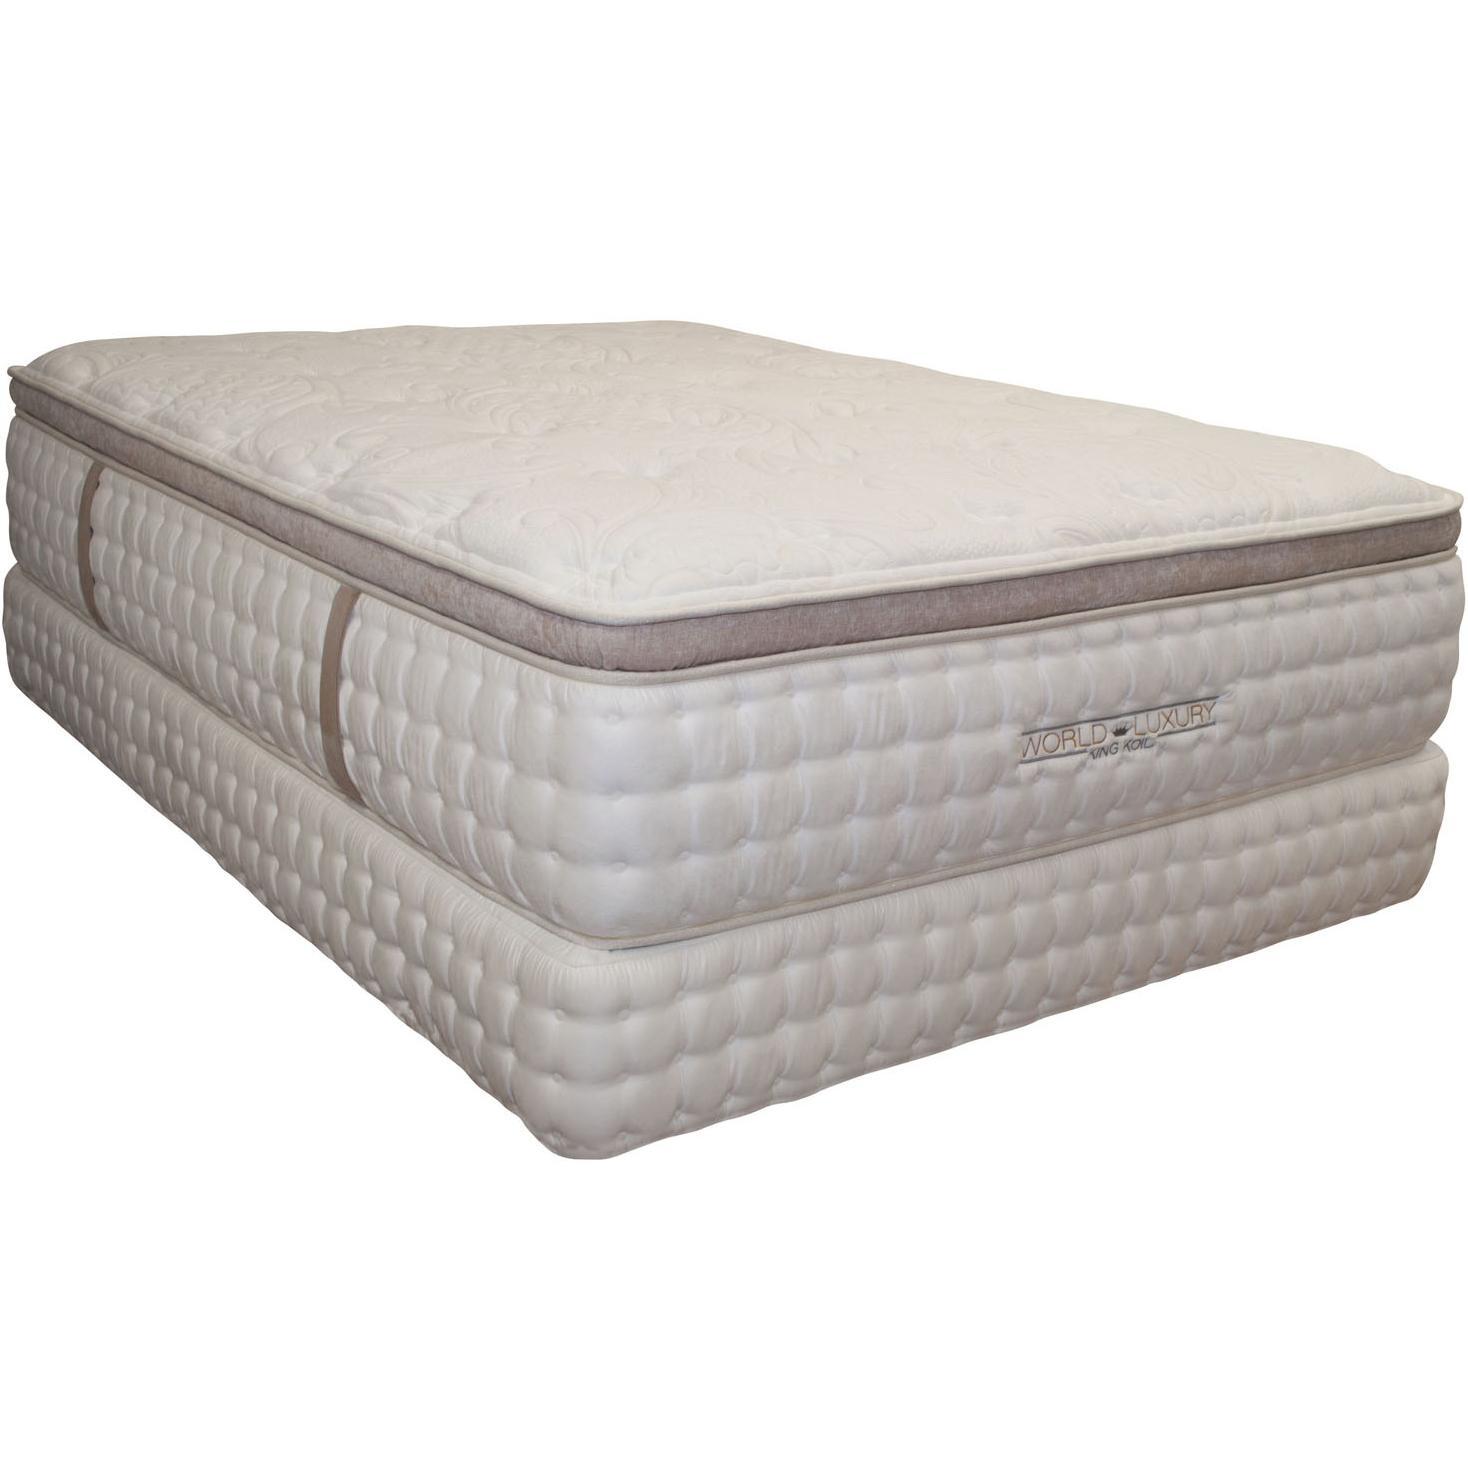 King Koil World Luxury - Kingsbury Queen Pillow Top ...